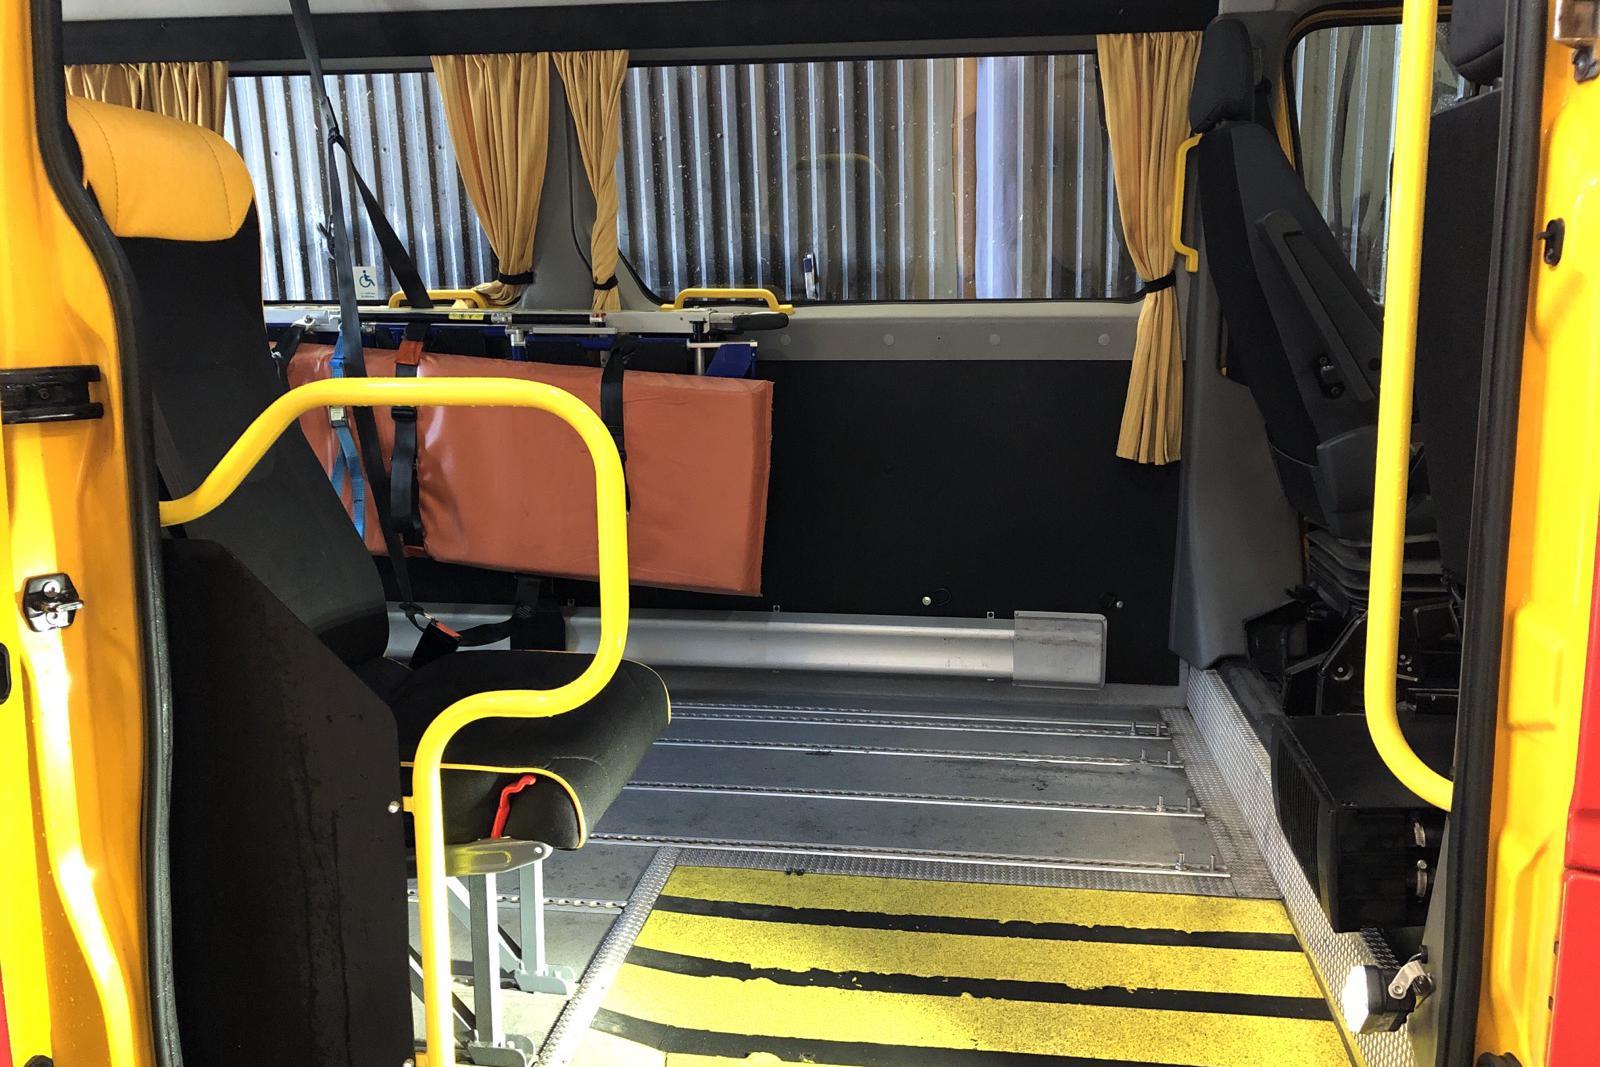 Renault Master 2.3 dCi Buss 2WD (145hk) - 0 km - Manual - yellow - 2016